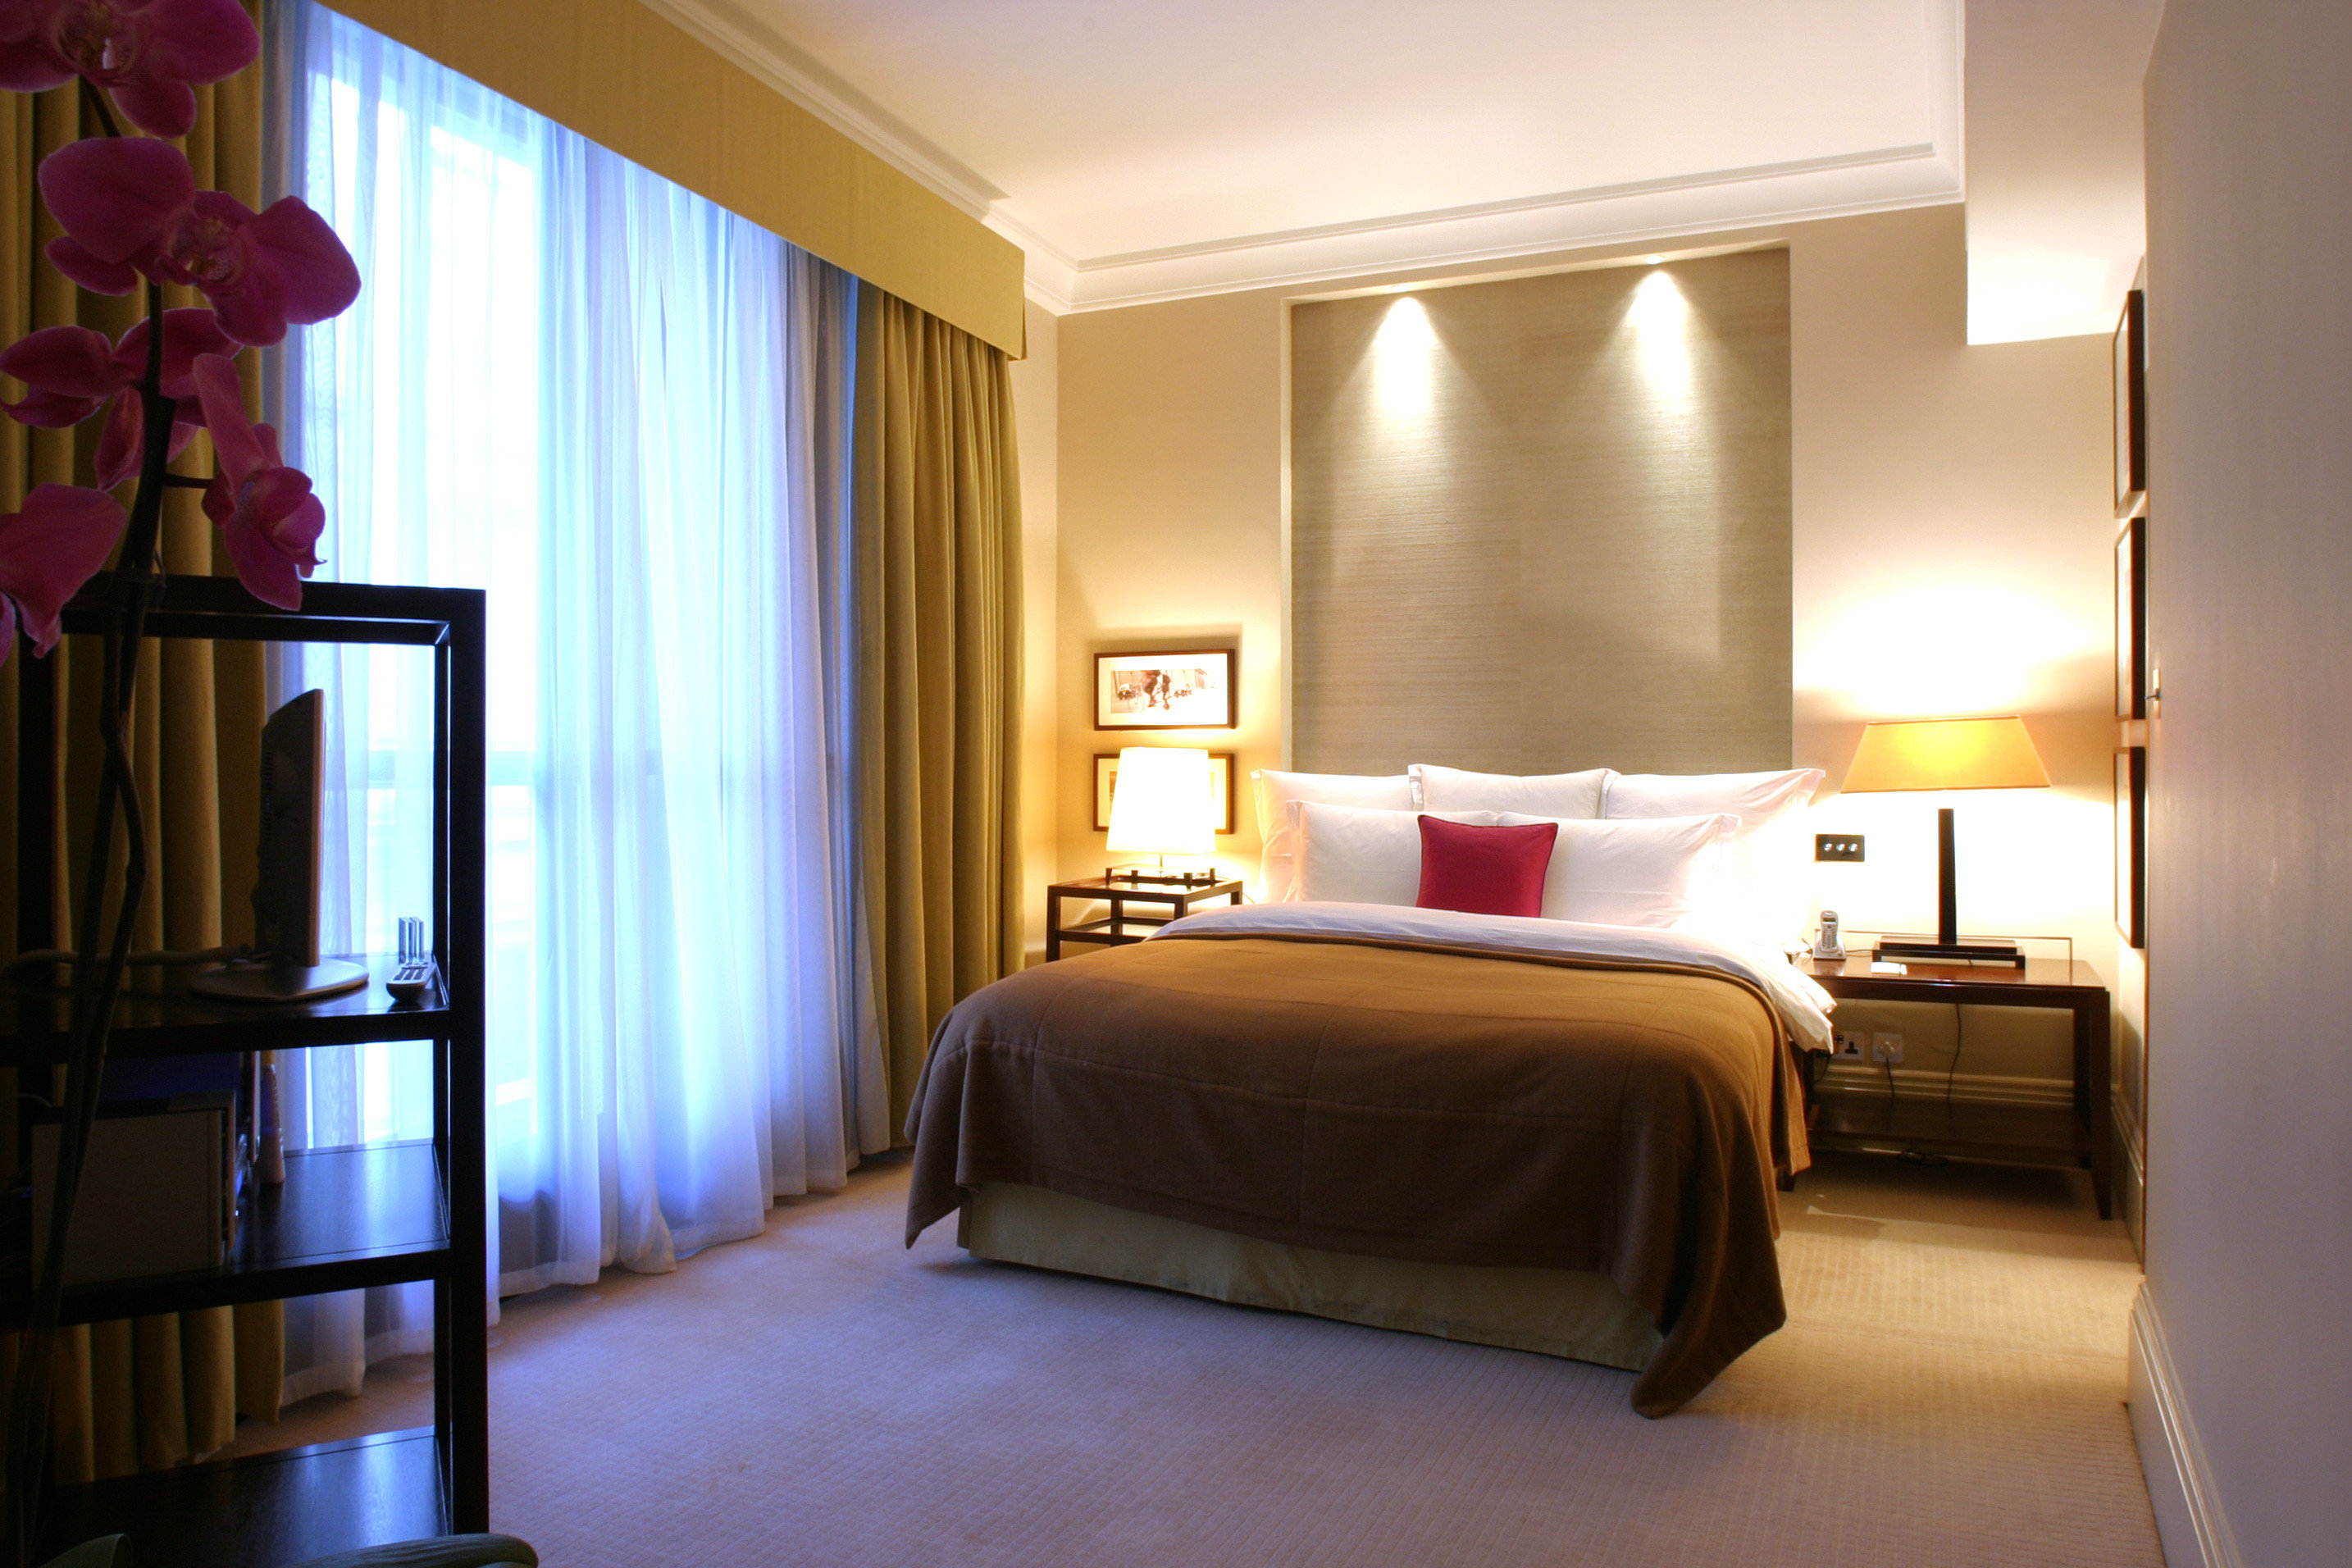 Bedroom Luxury Modern Suite property